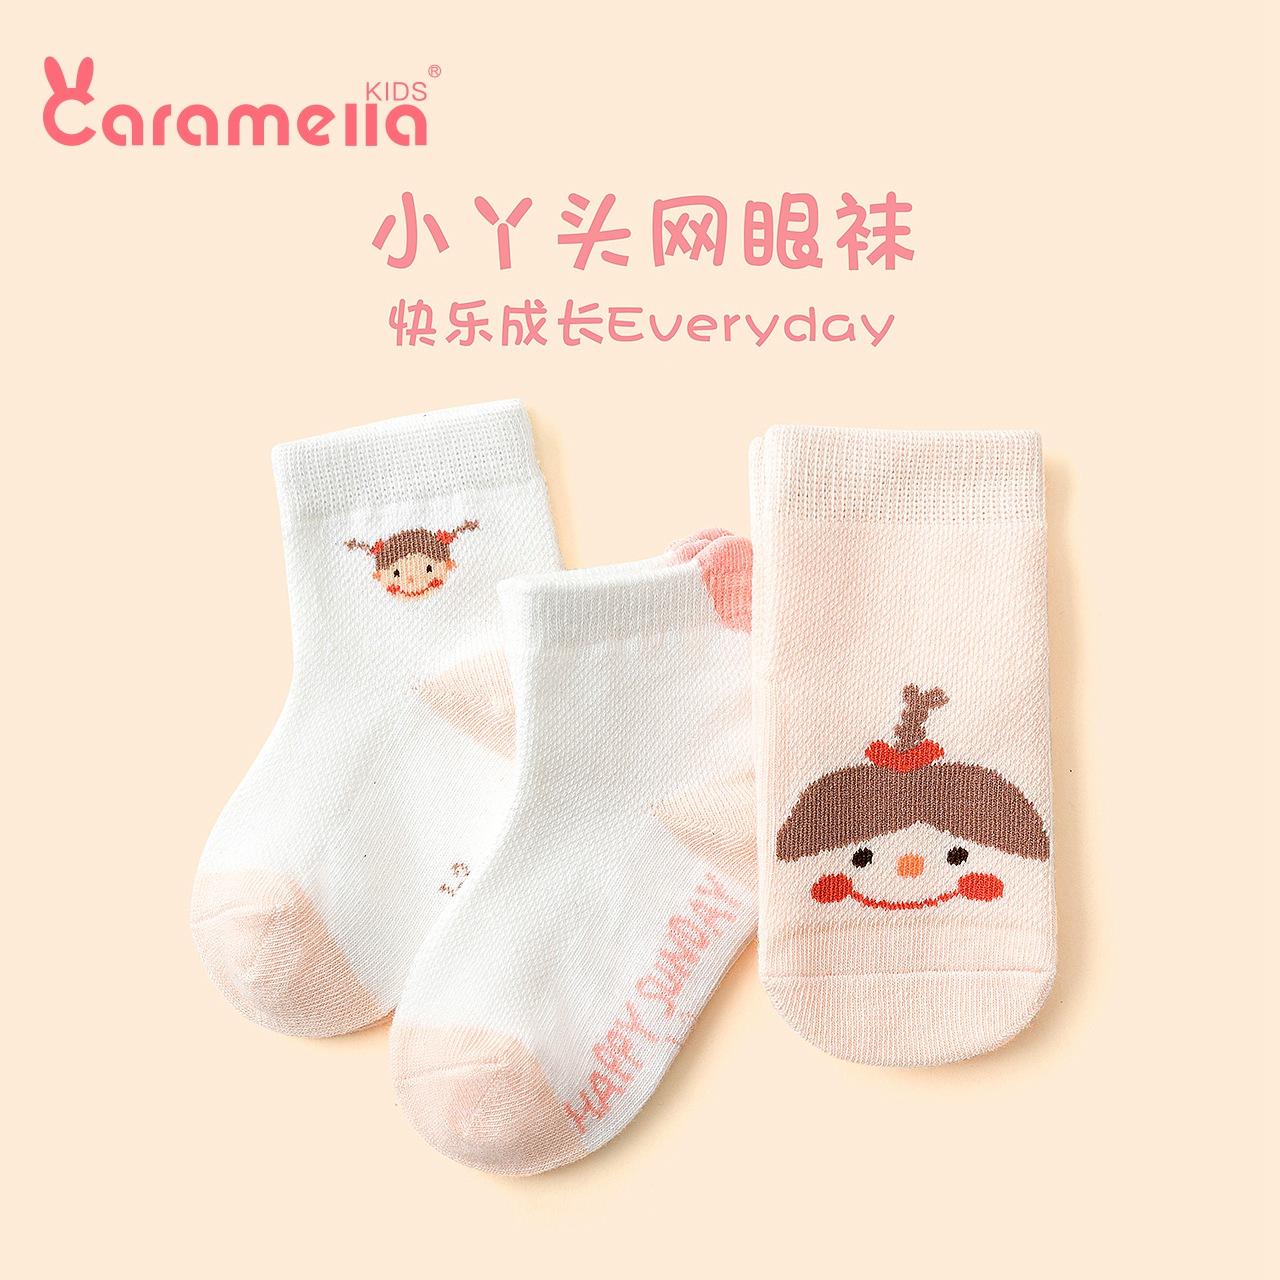 CARAMELLA直播纯棉短袜女童新生儿婴儿夏季可爱薄款宝宝儿童袜子